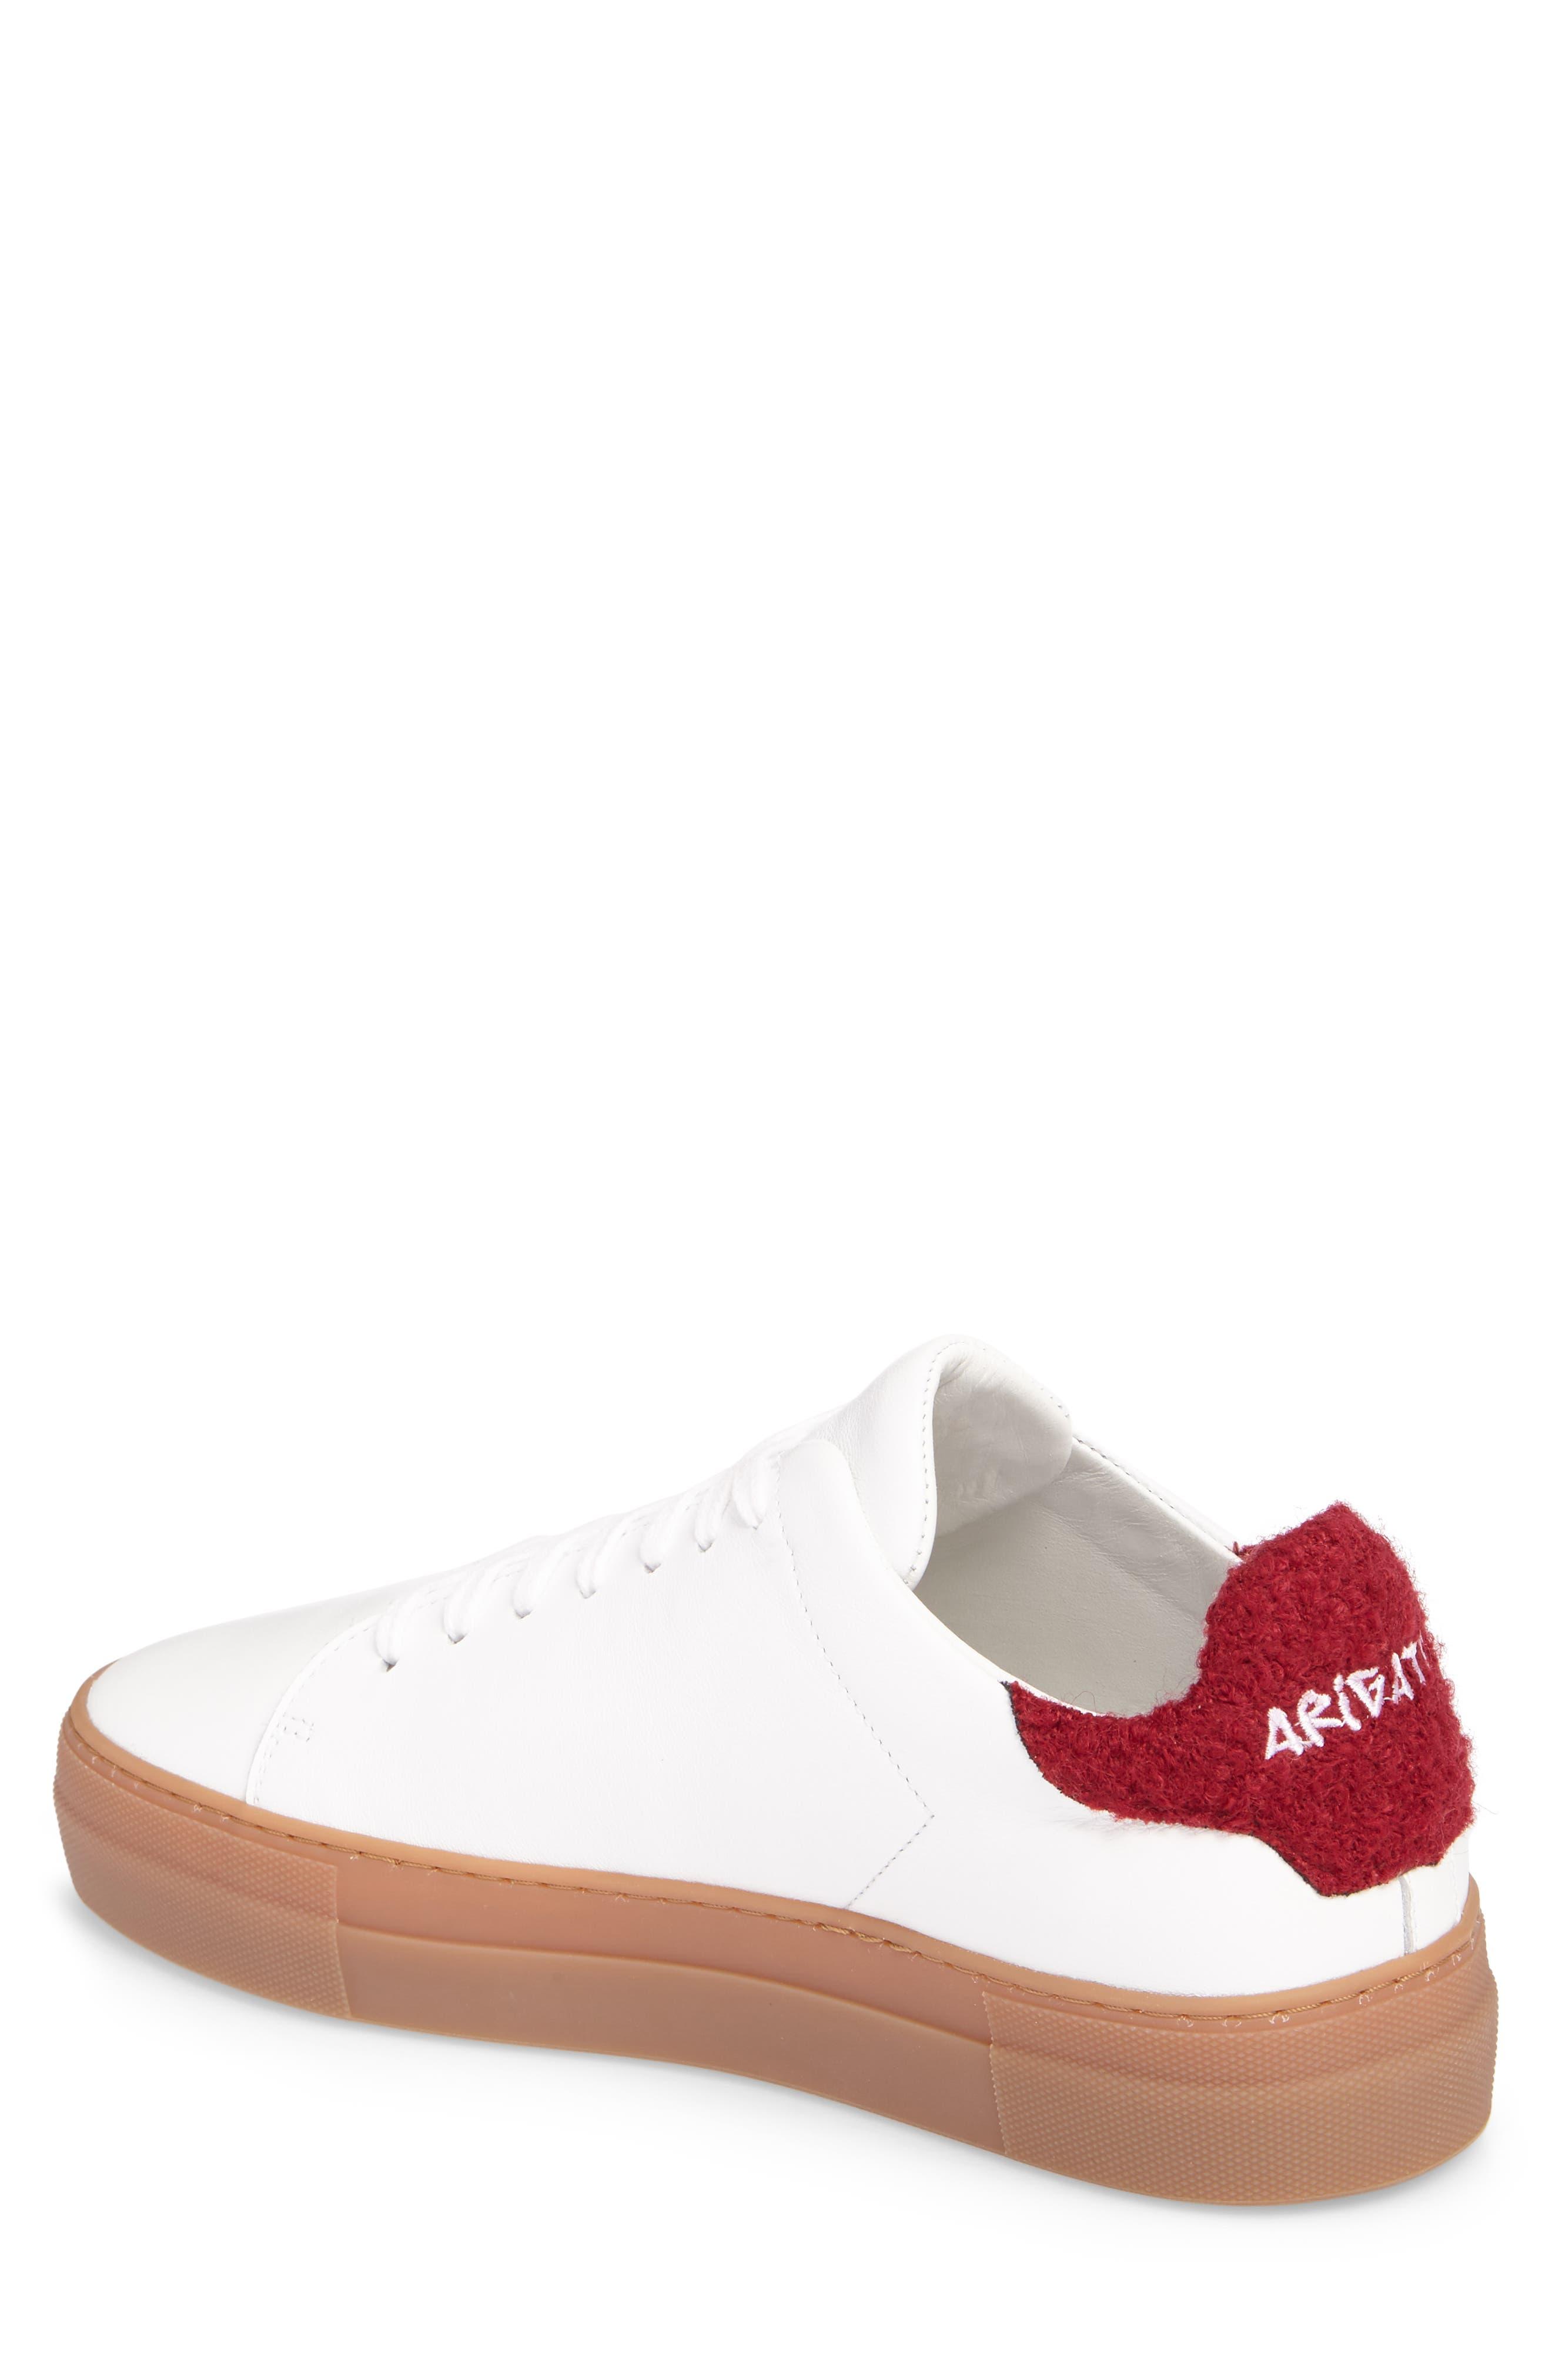 Clean 360 Fuzzy Heel Sneaker,                             Alternate thumbnail 2, color,                             100